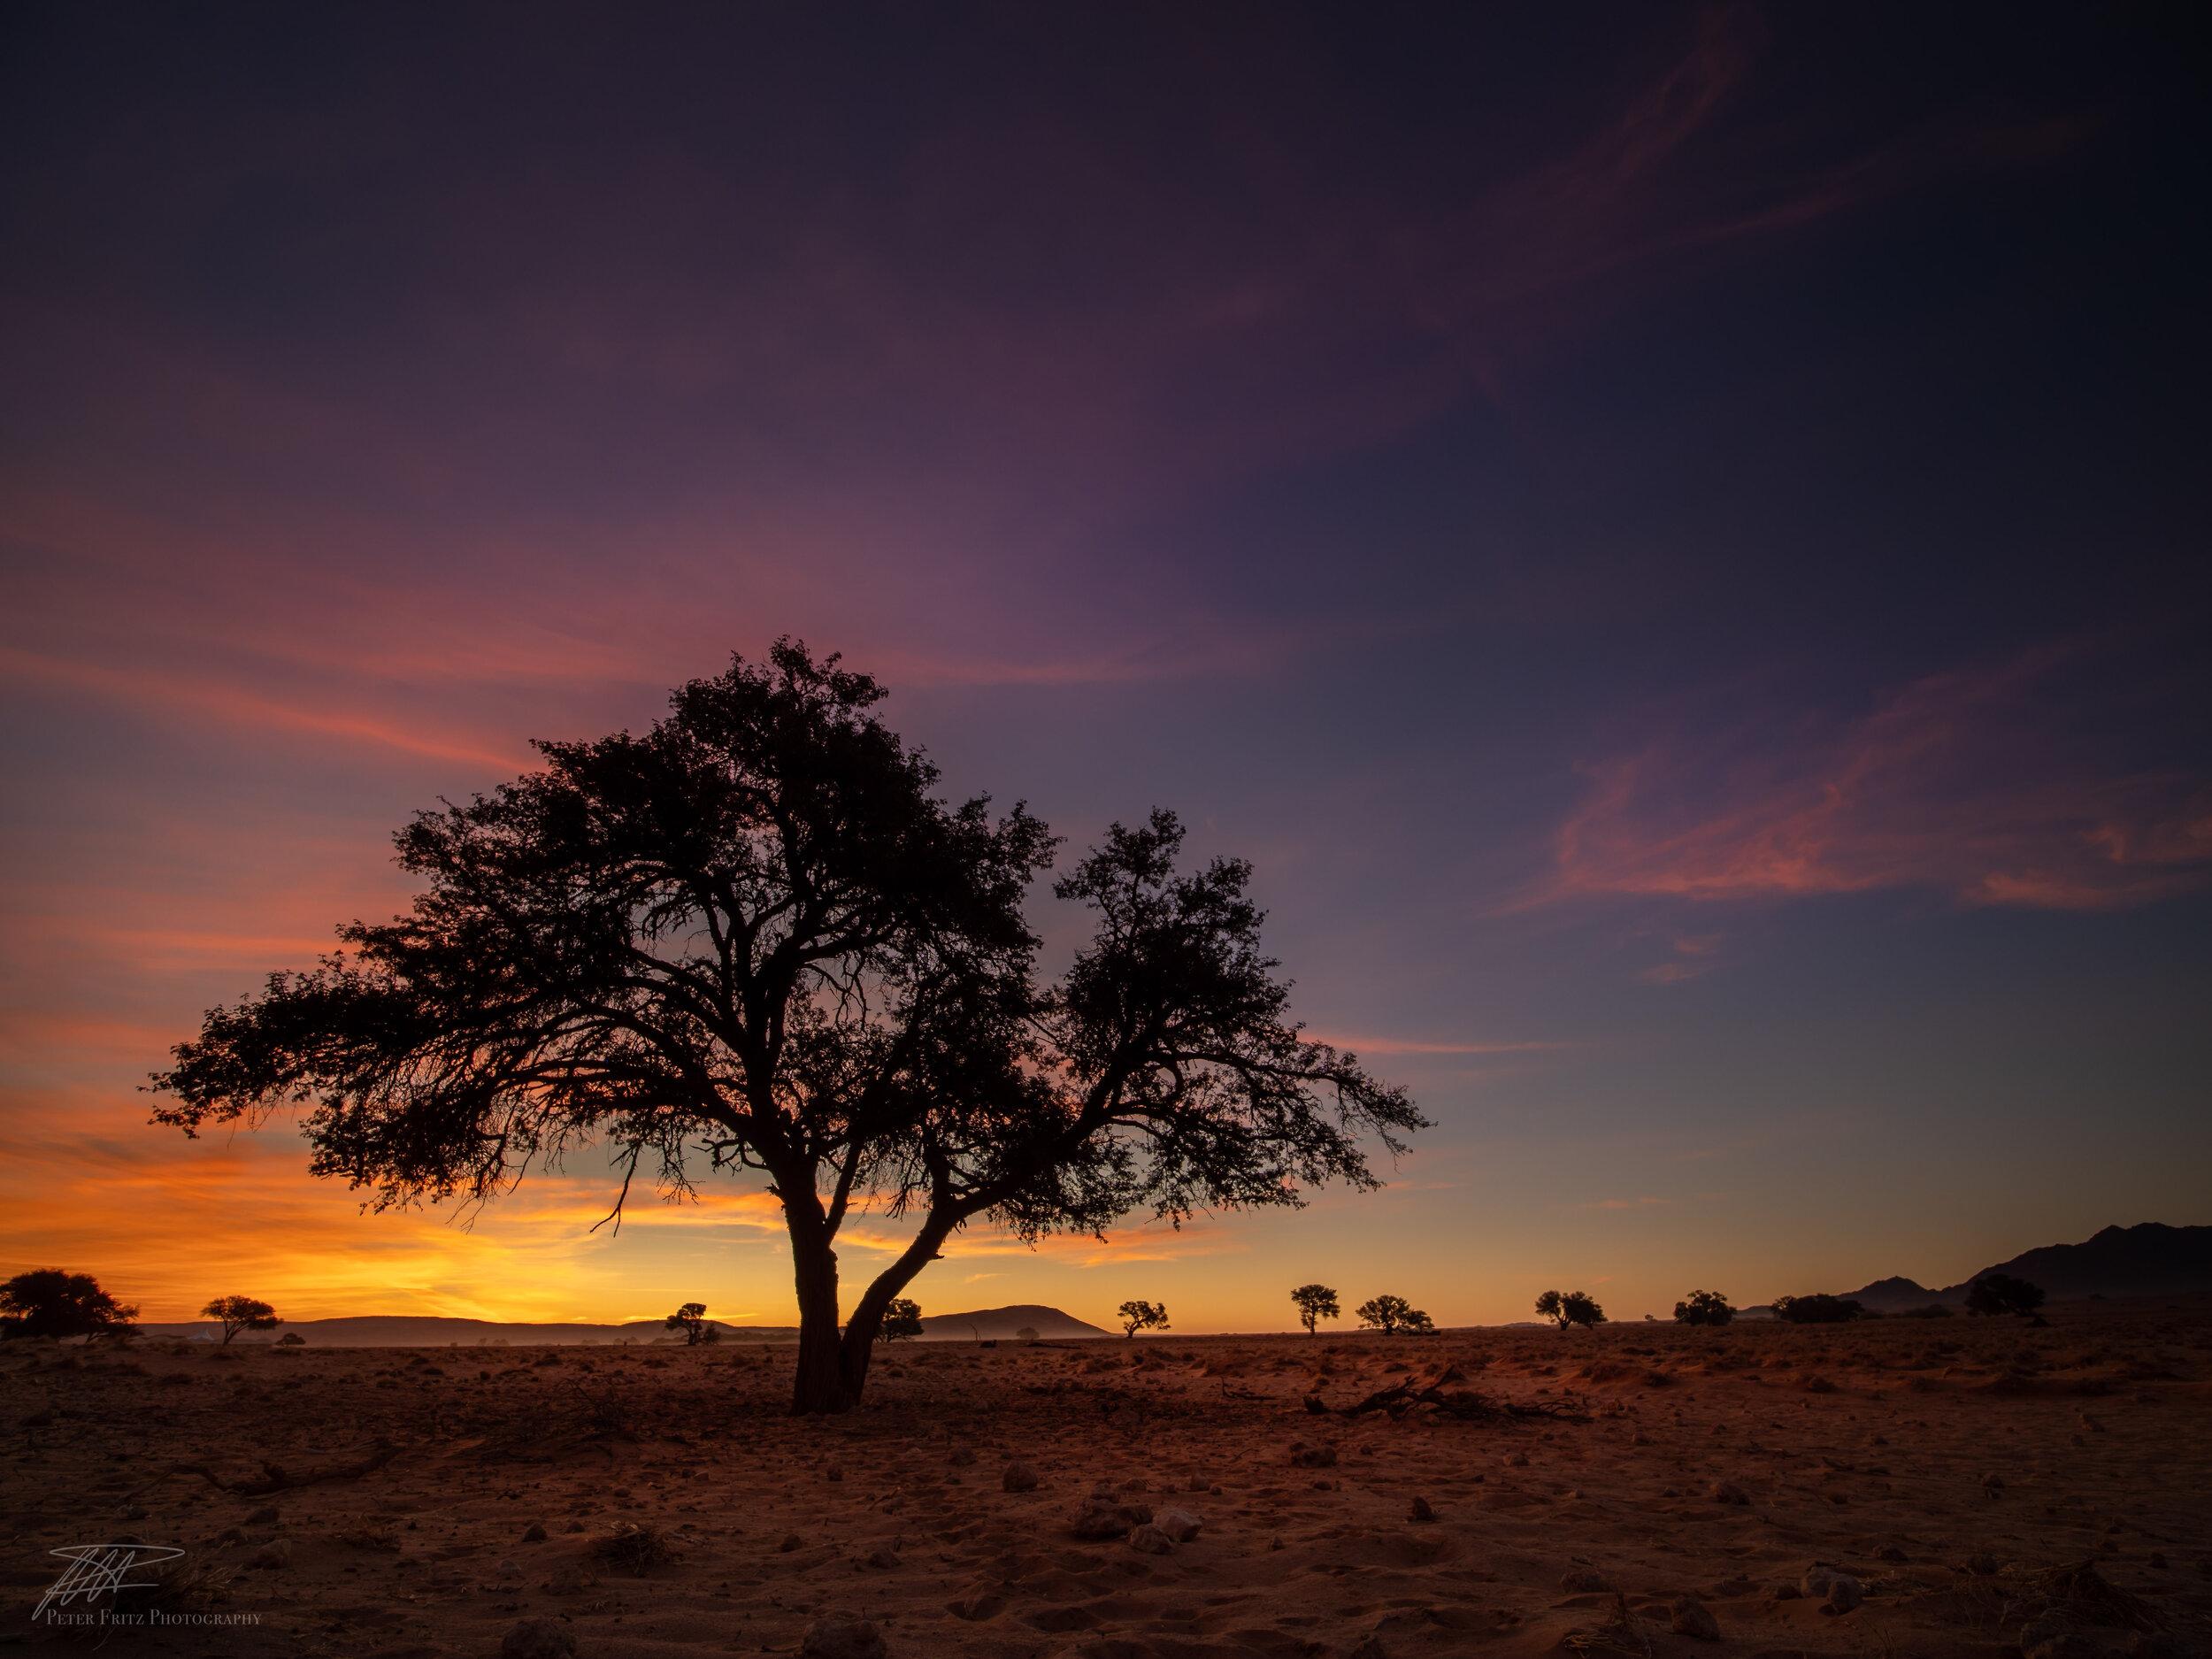 African Sunset 4x3 web.jpg